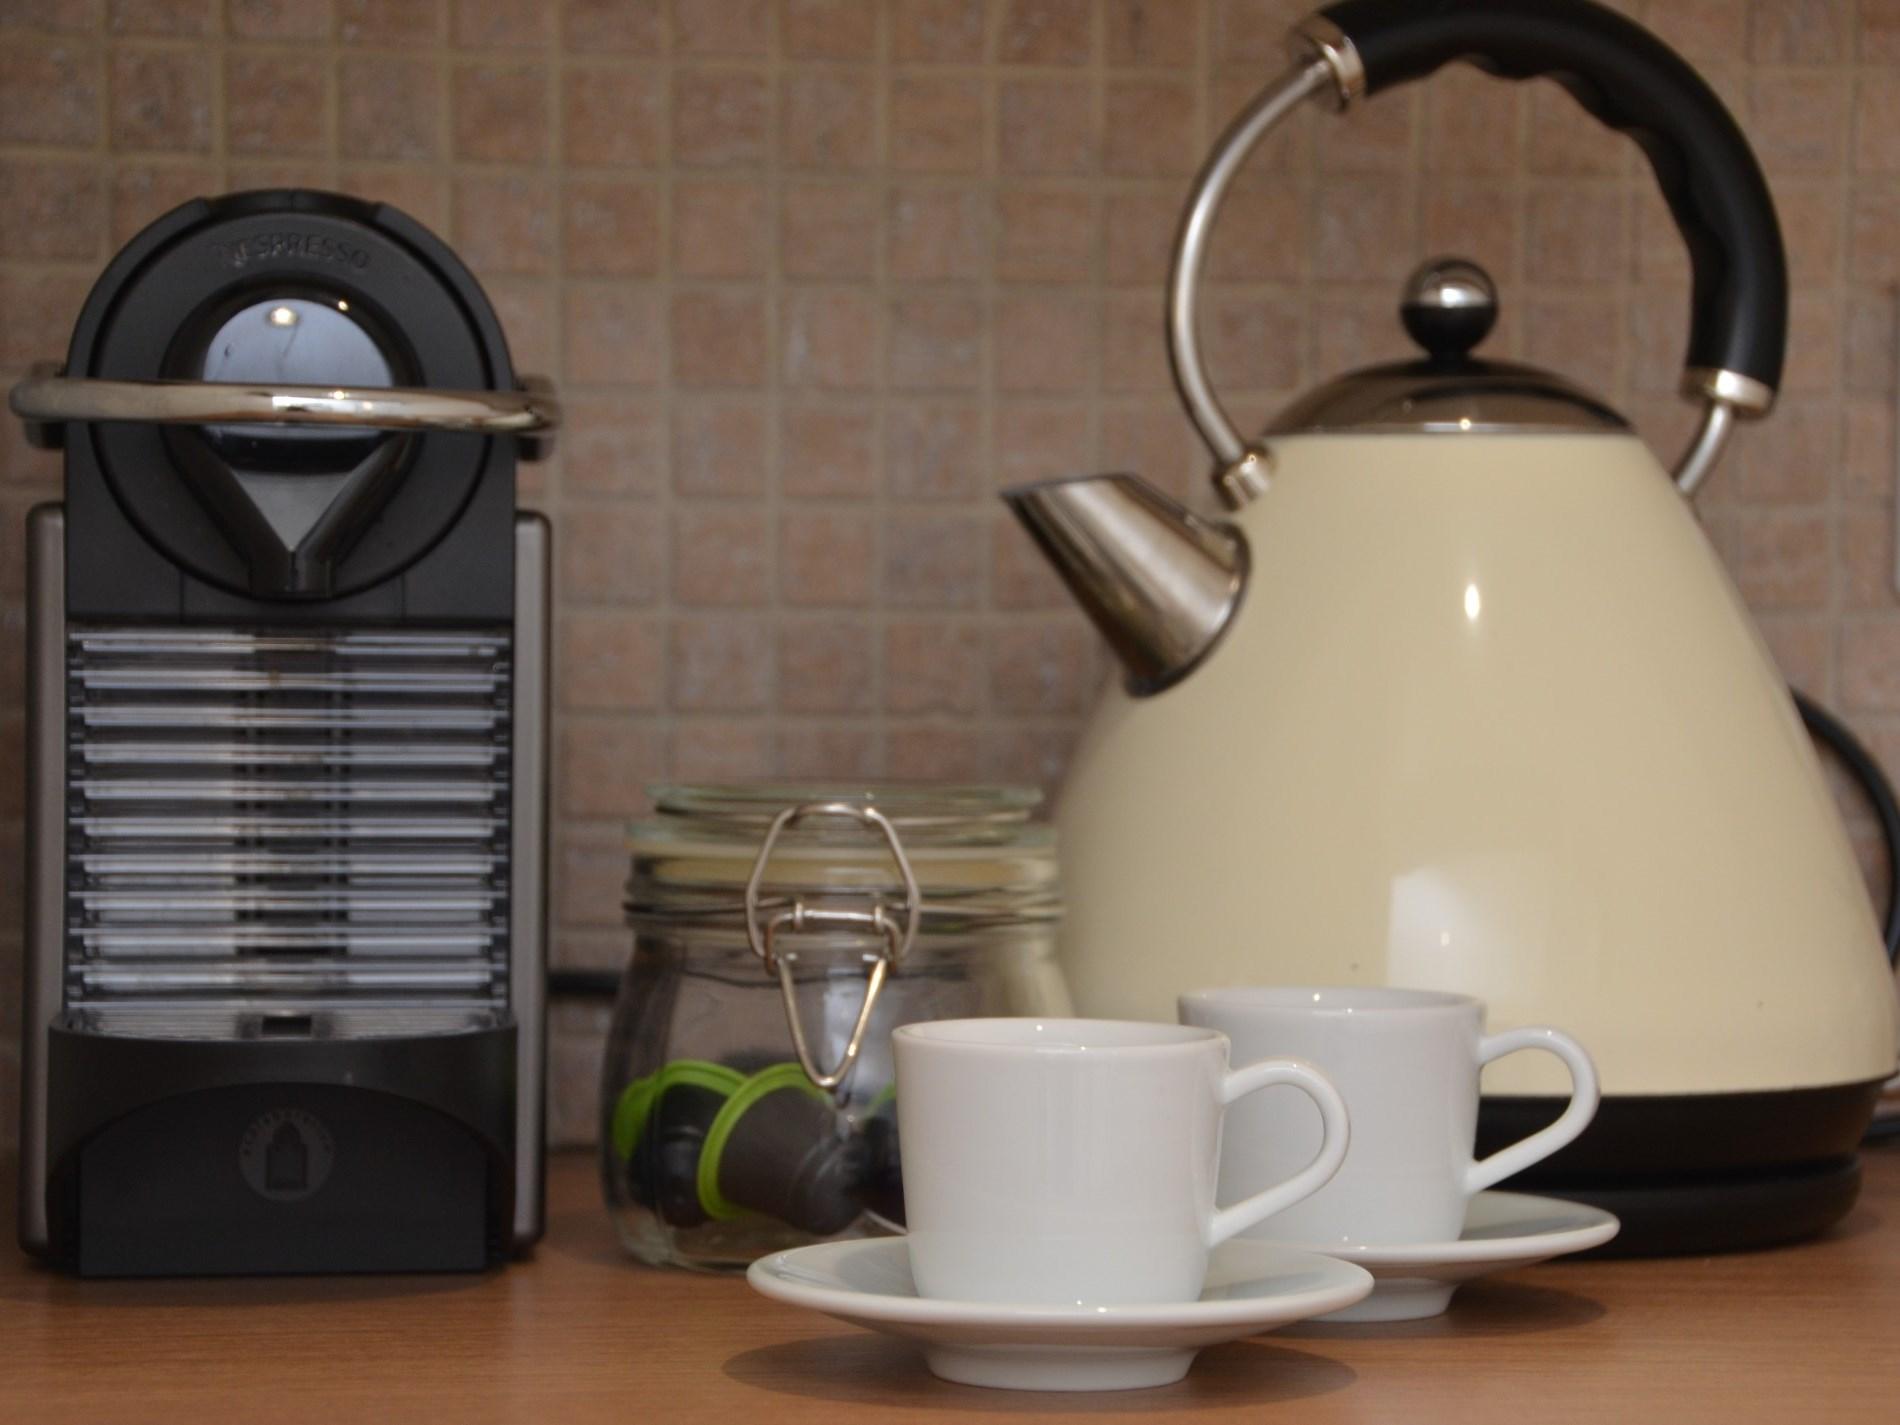 Fresh nespresso coffee in the morning